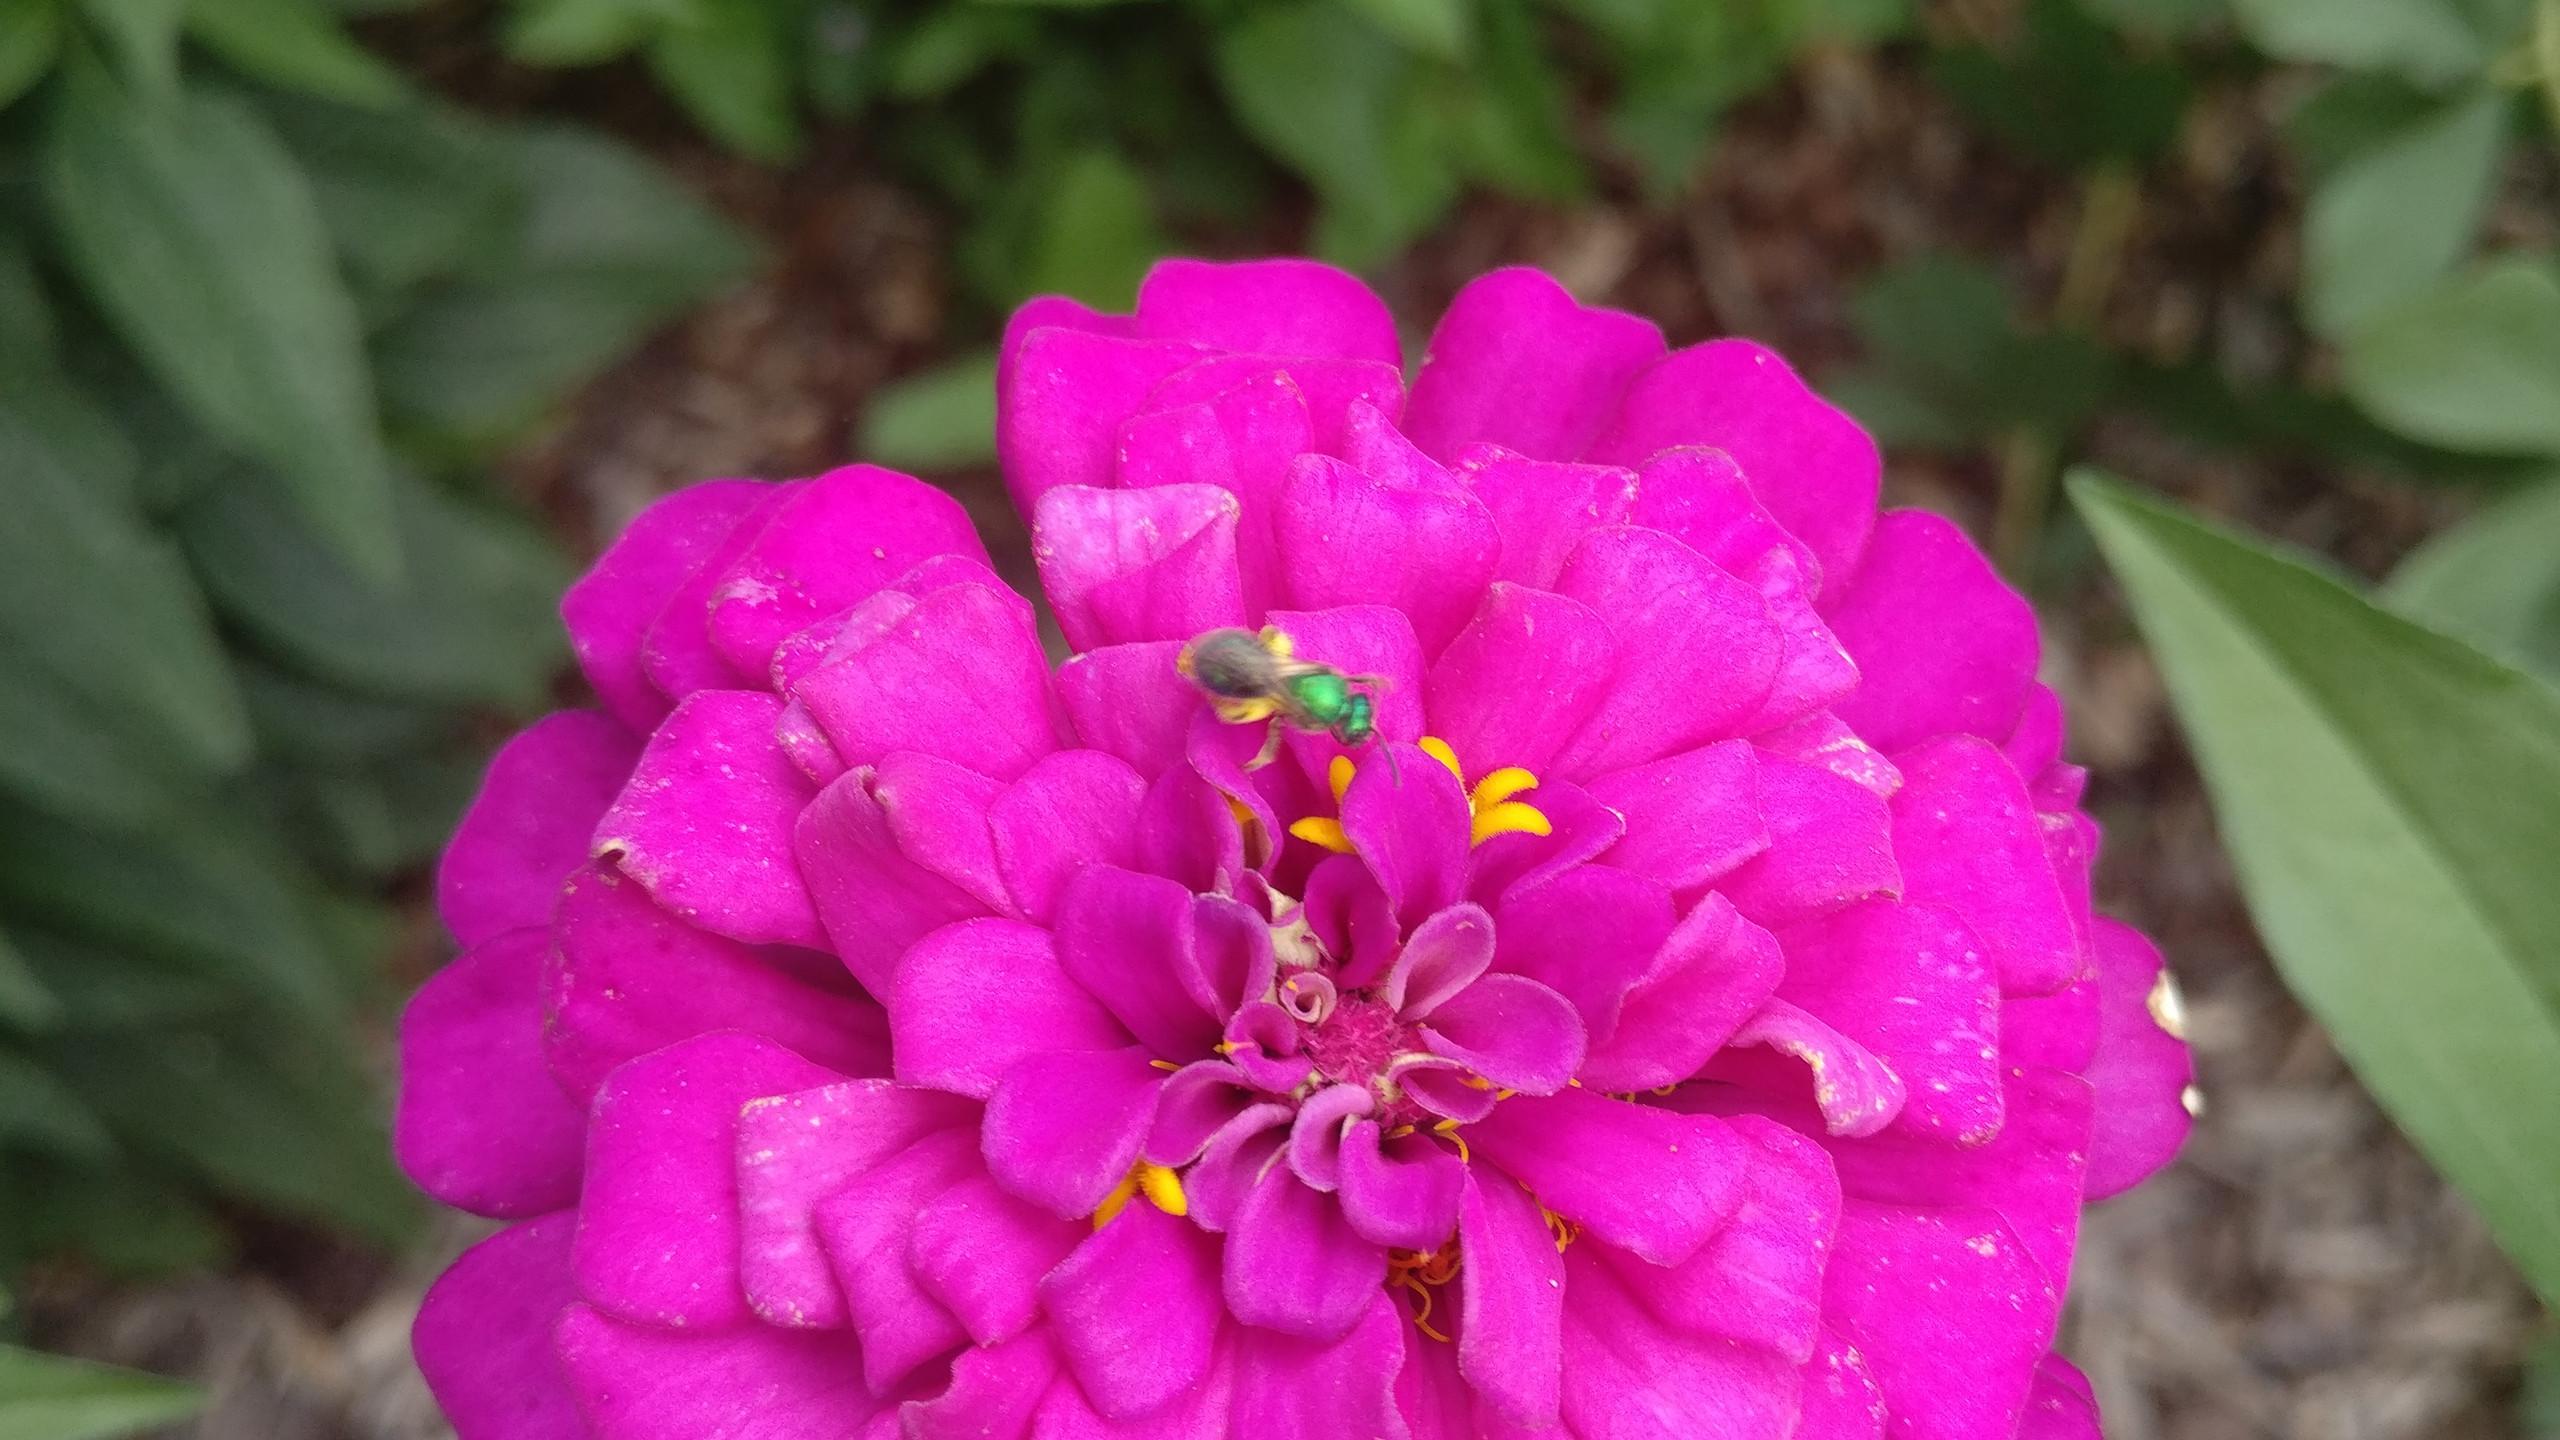 Zinnia Striped Sweat Bee 23 June 2018